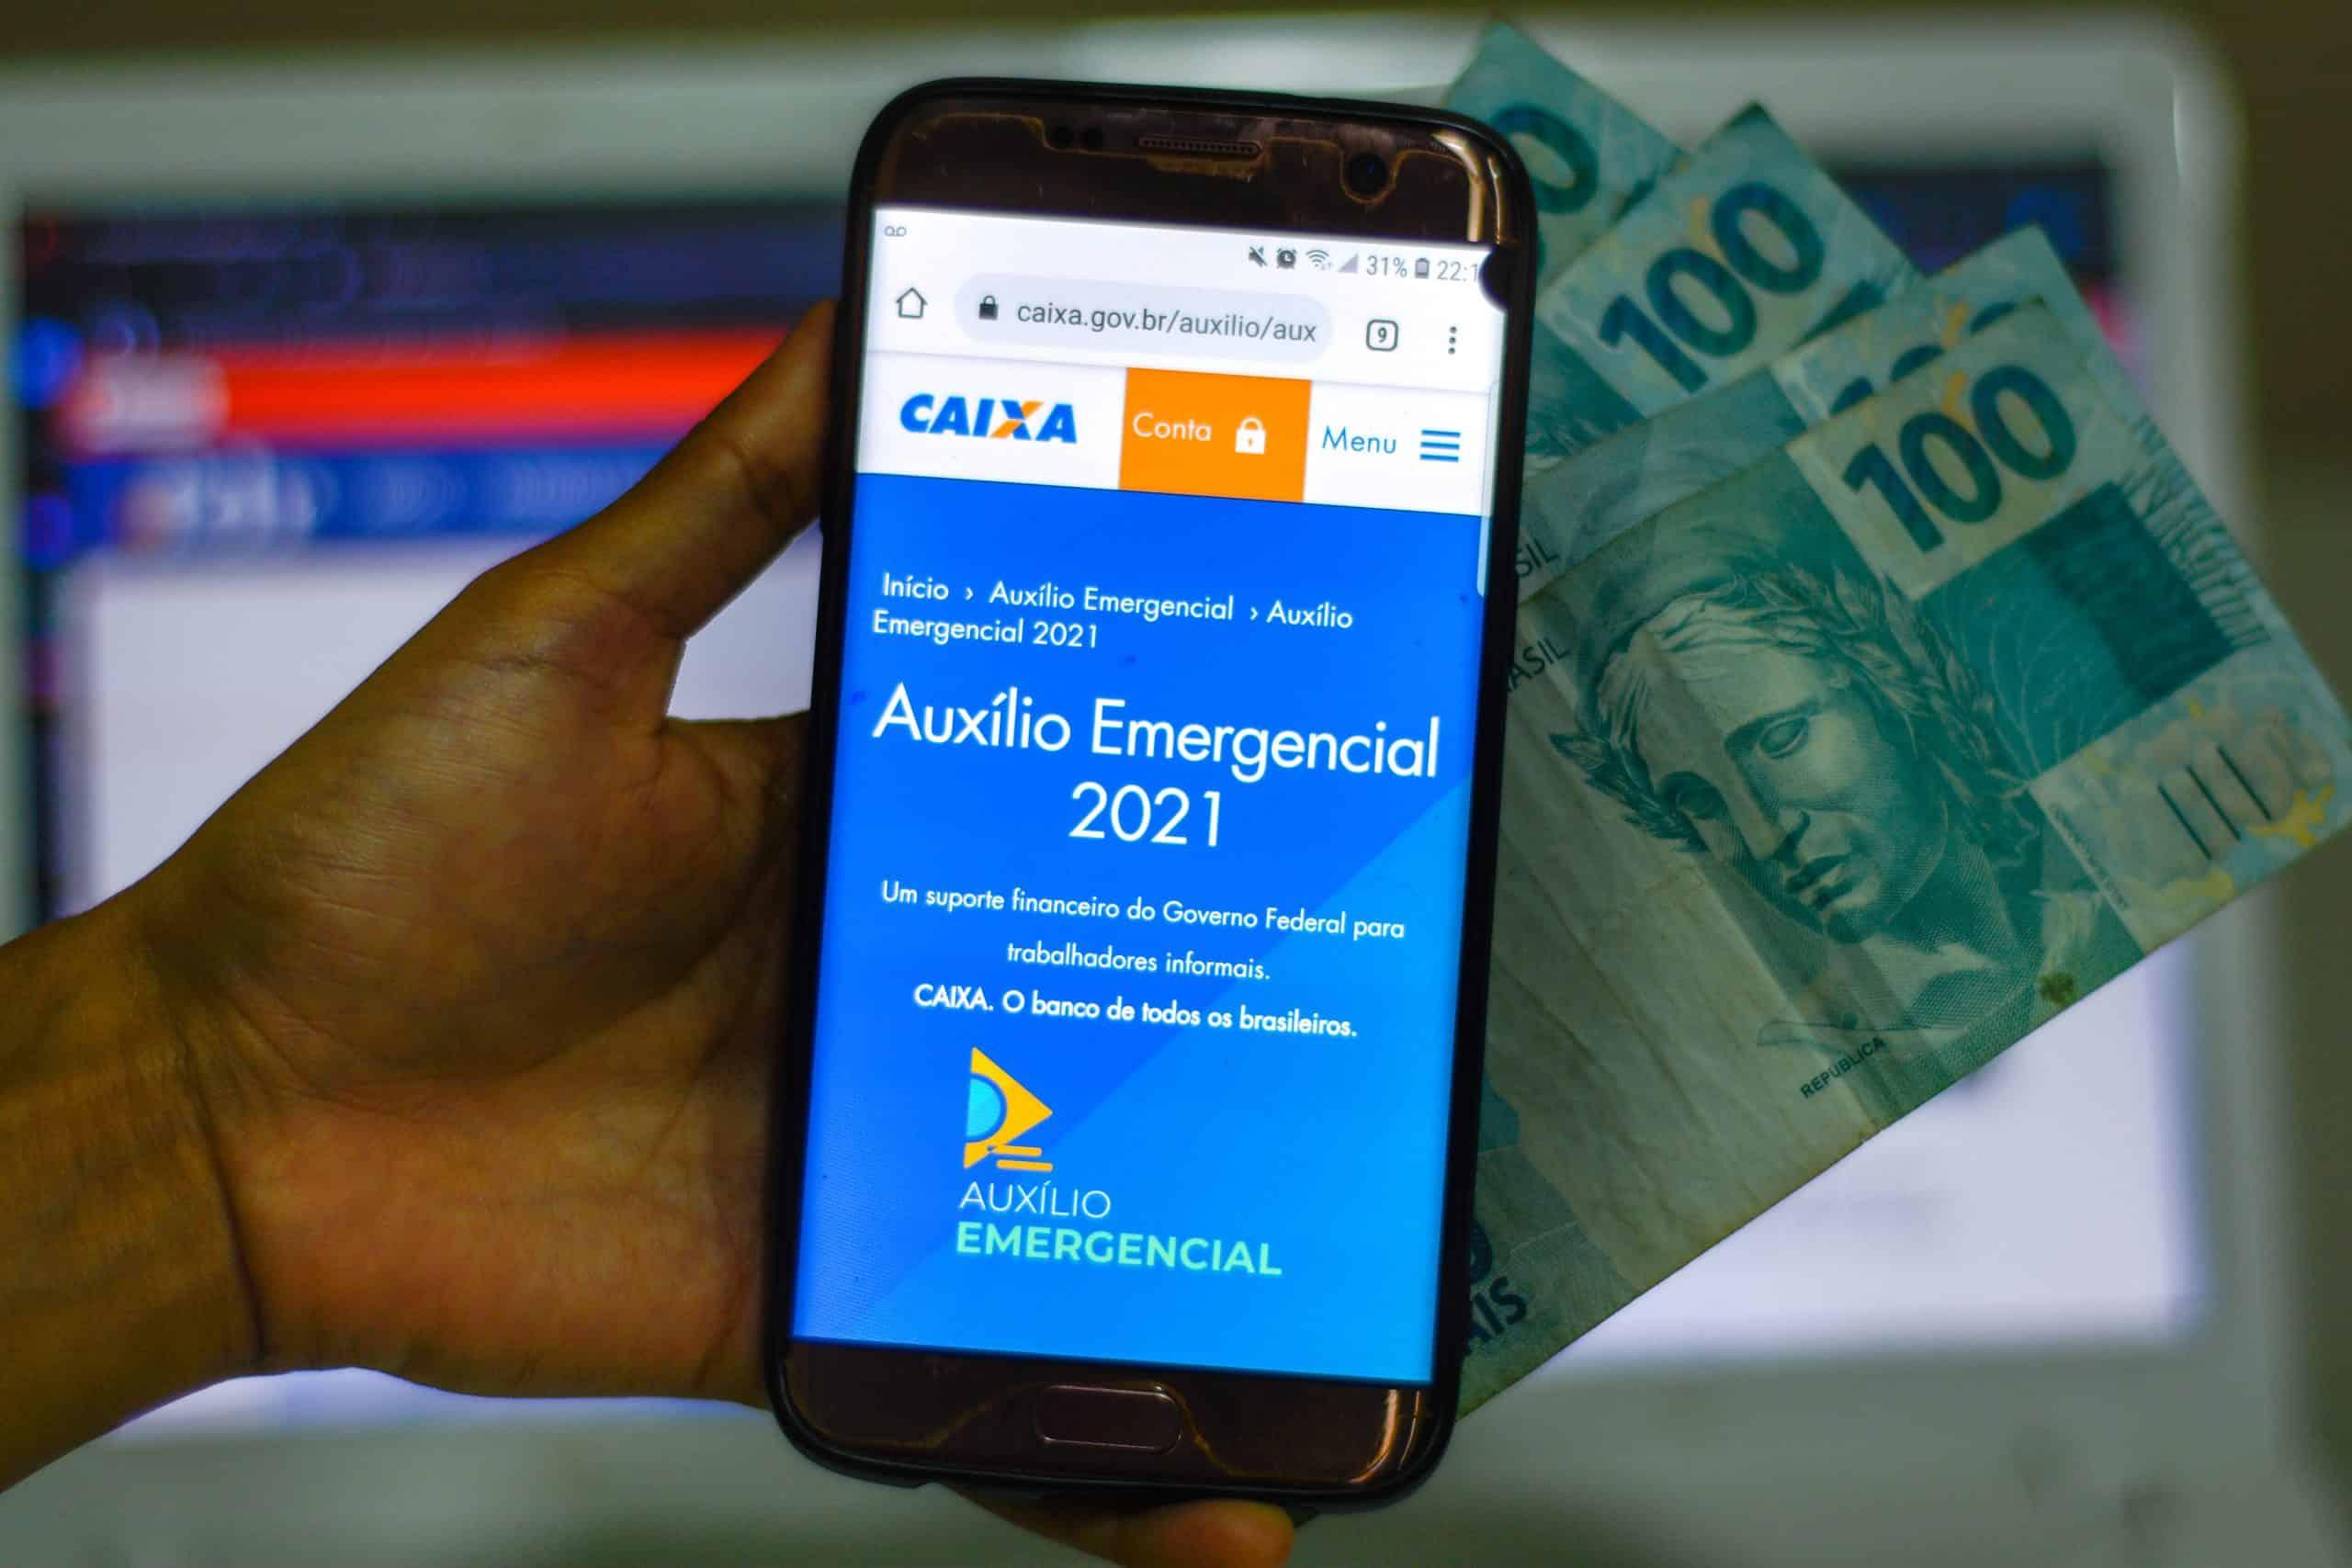 Auxílio Emergencial -Auxílio Emergencial 2022